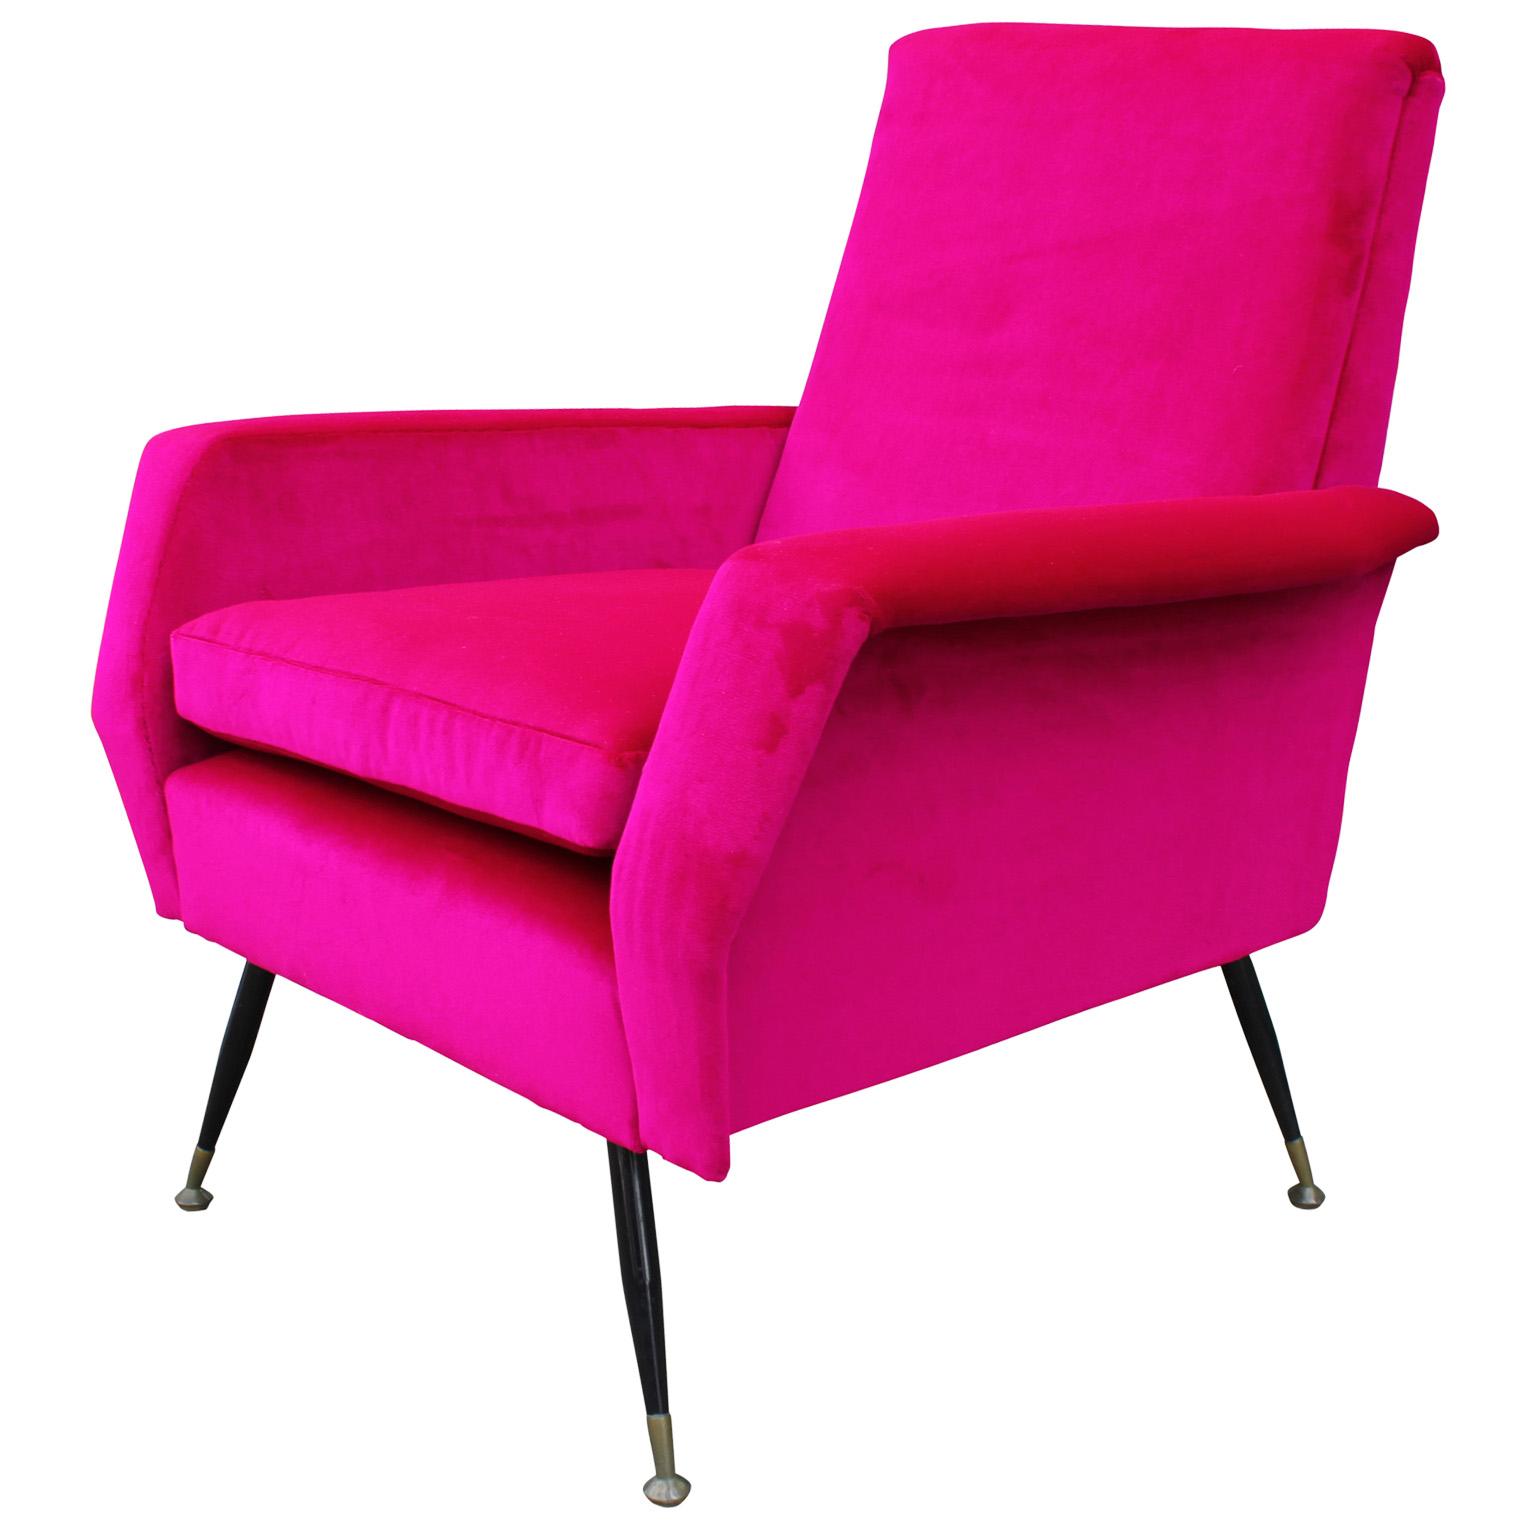 Incredible Bold Pink Velvet Italian Lounge Chair